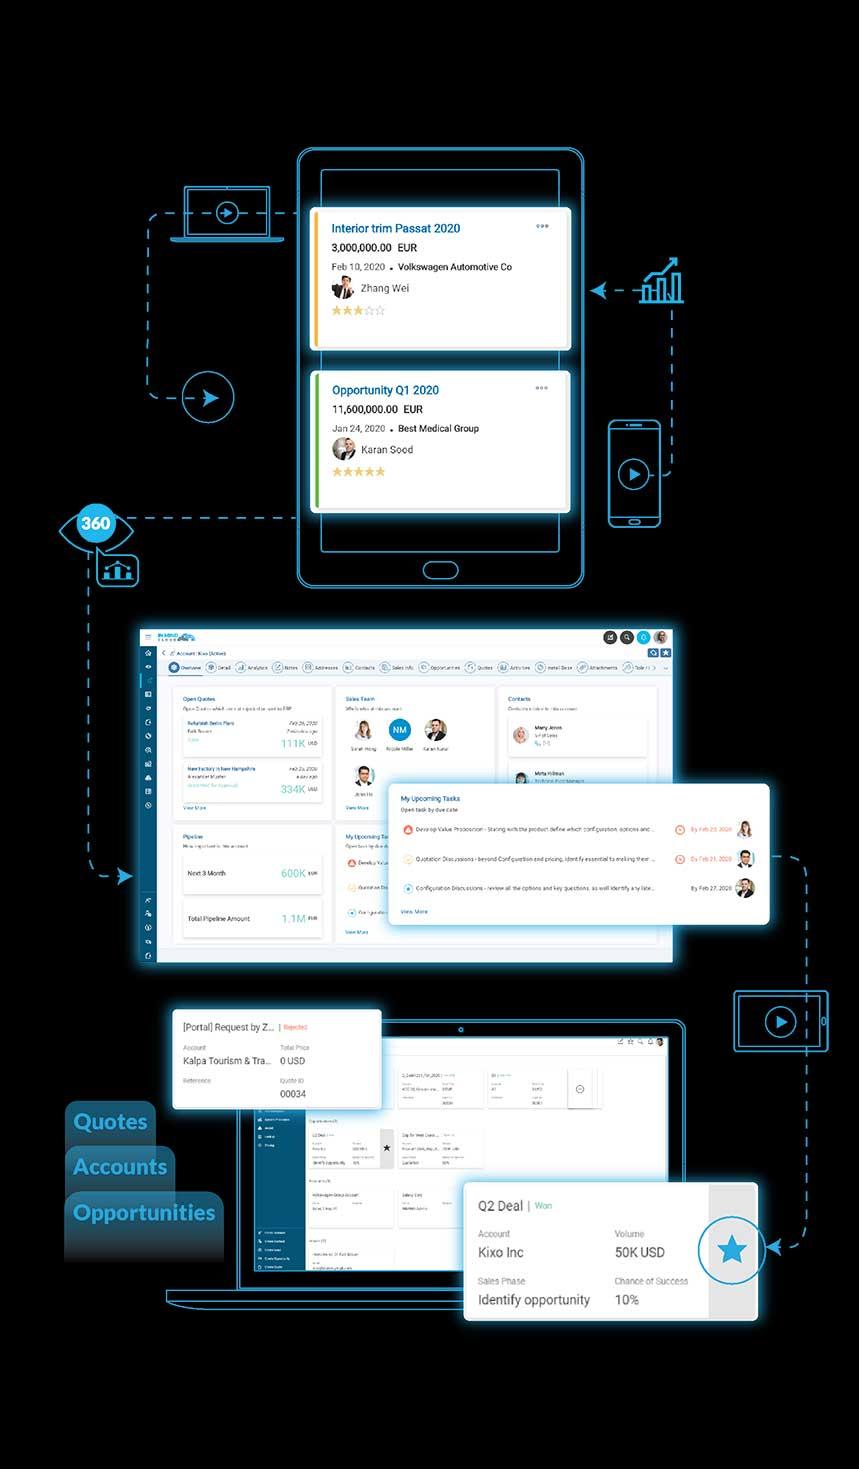 Sales Management - 360º Transparenz über alle Kanäle hinweg